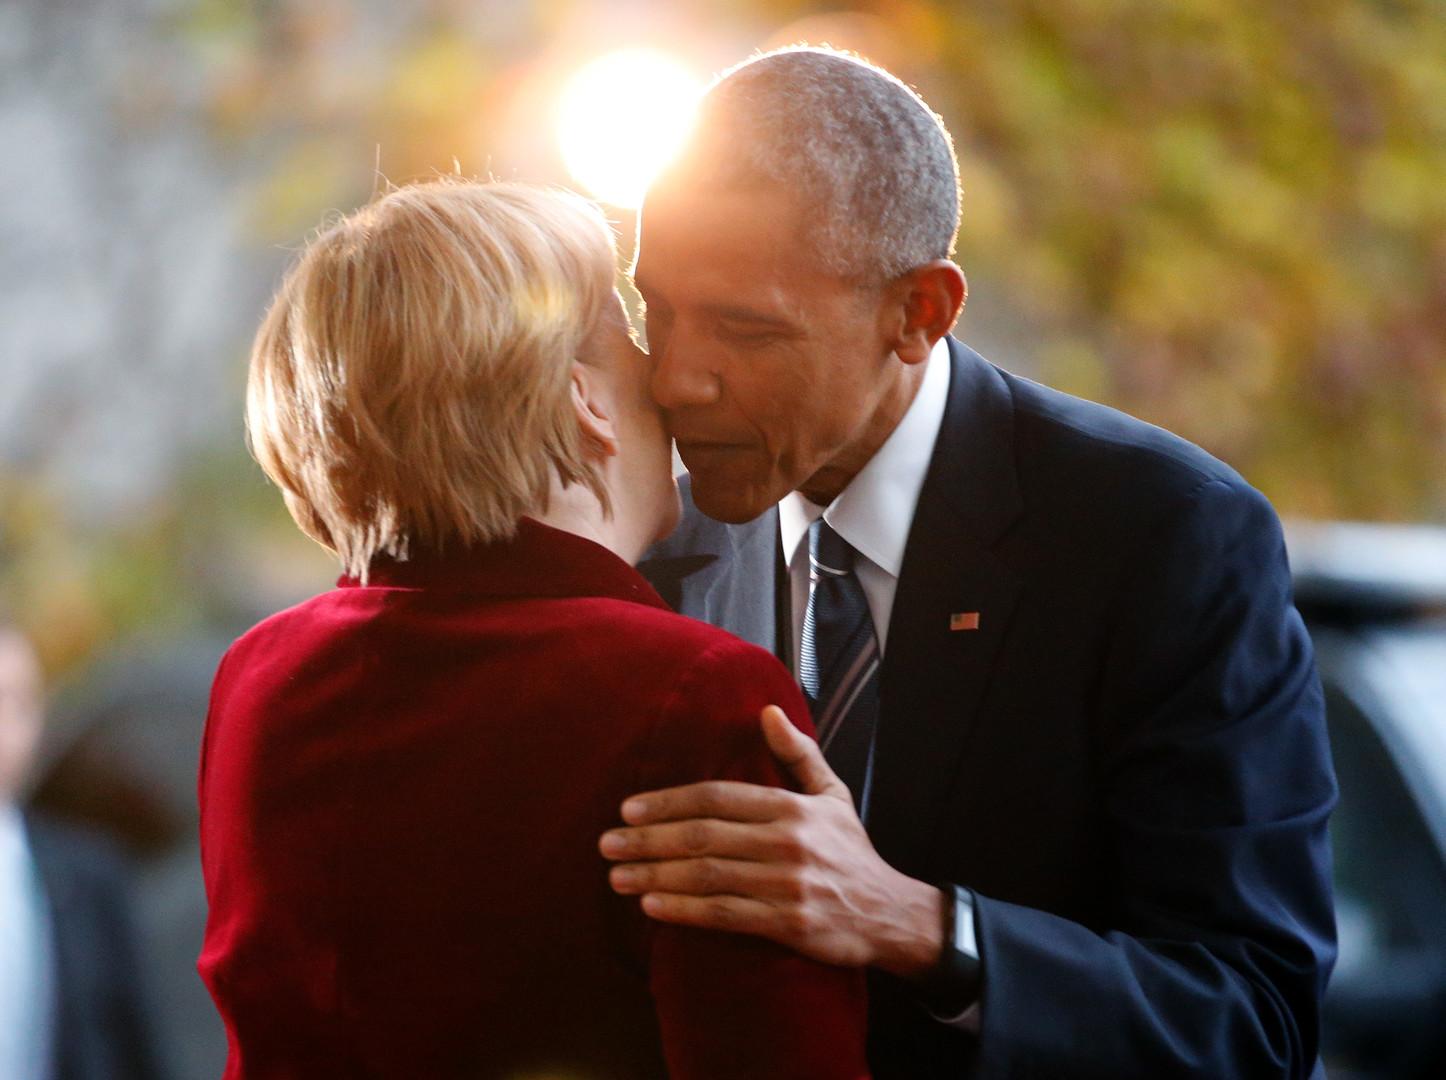 A la fin de son mandat, Barack Obama étreint Angela Merkel sans porter son alliance !